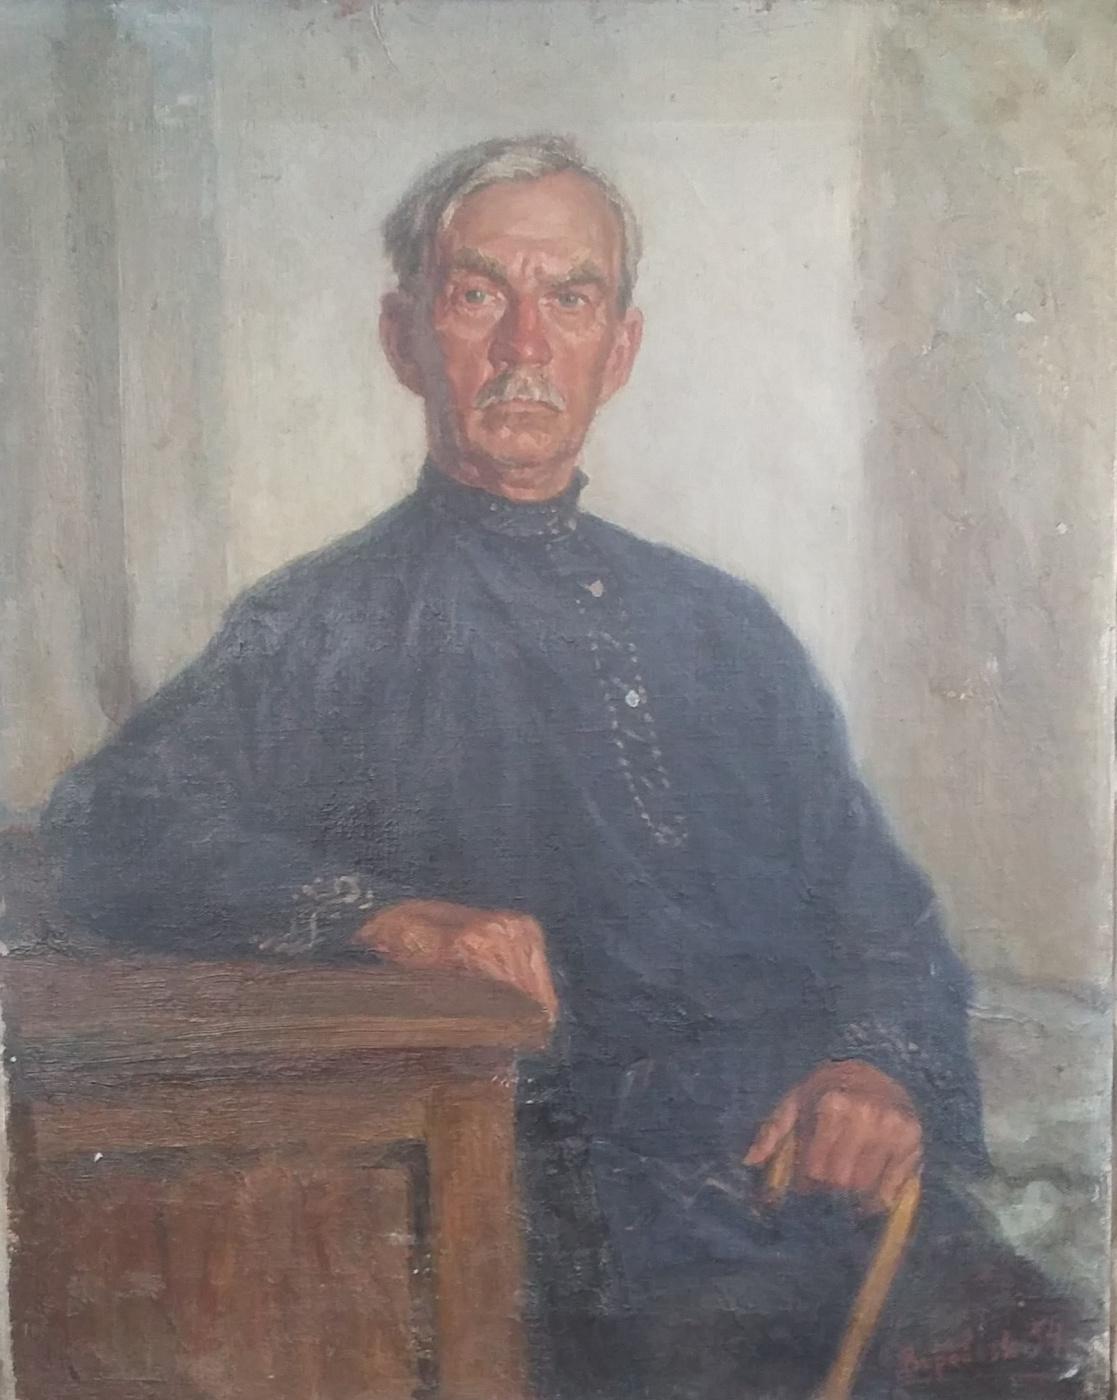 Mikhail Evgenievich Ponomarev. A daring escape from Minusinsk.